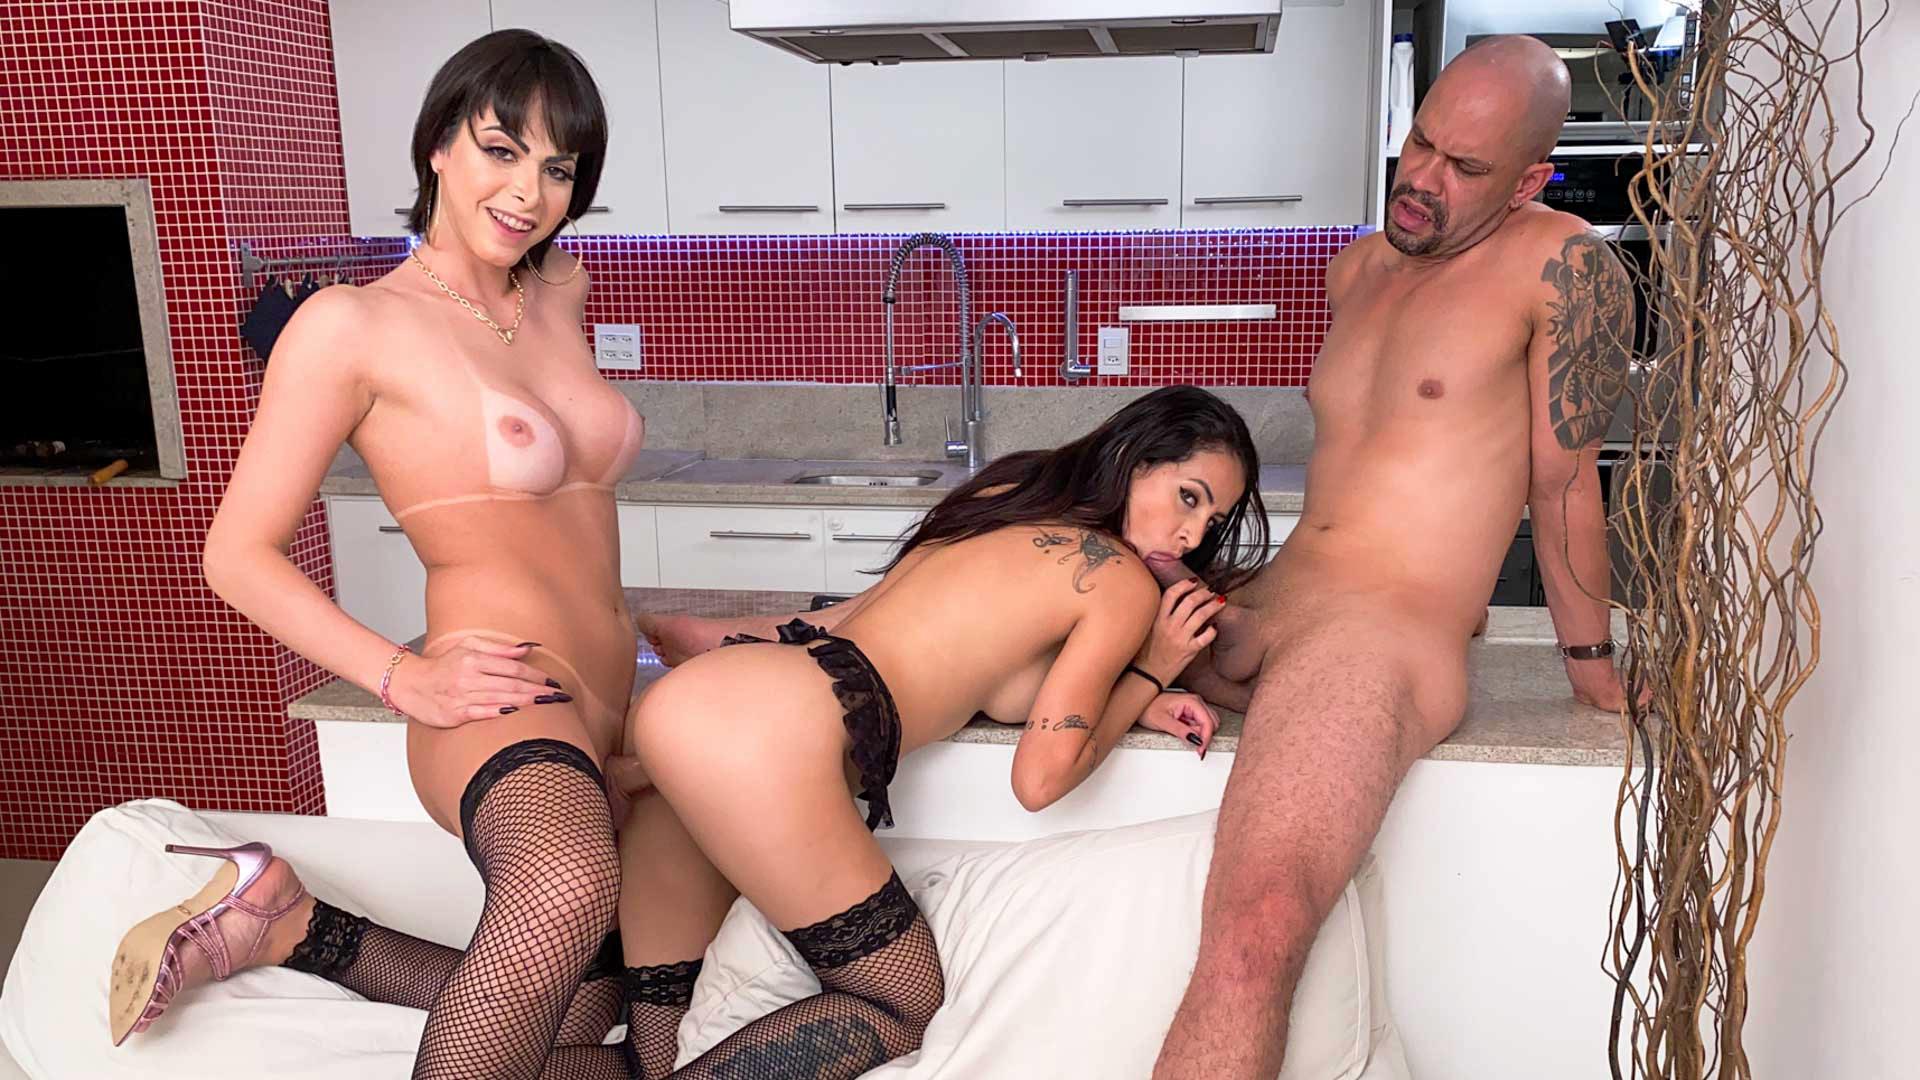 TS Barbara Perez + Cis Girl: Threesome